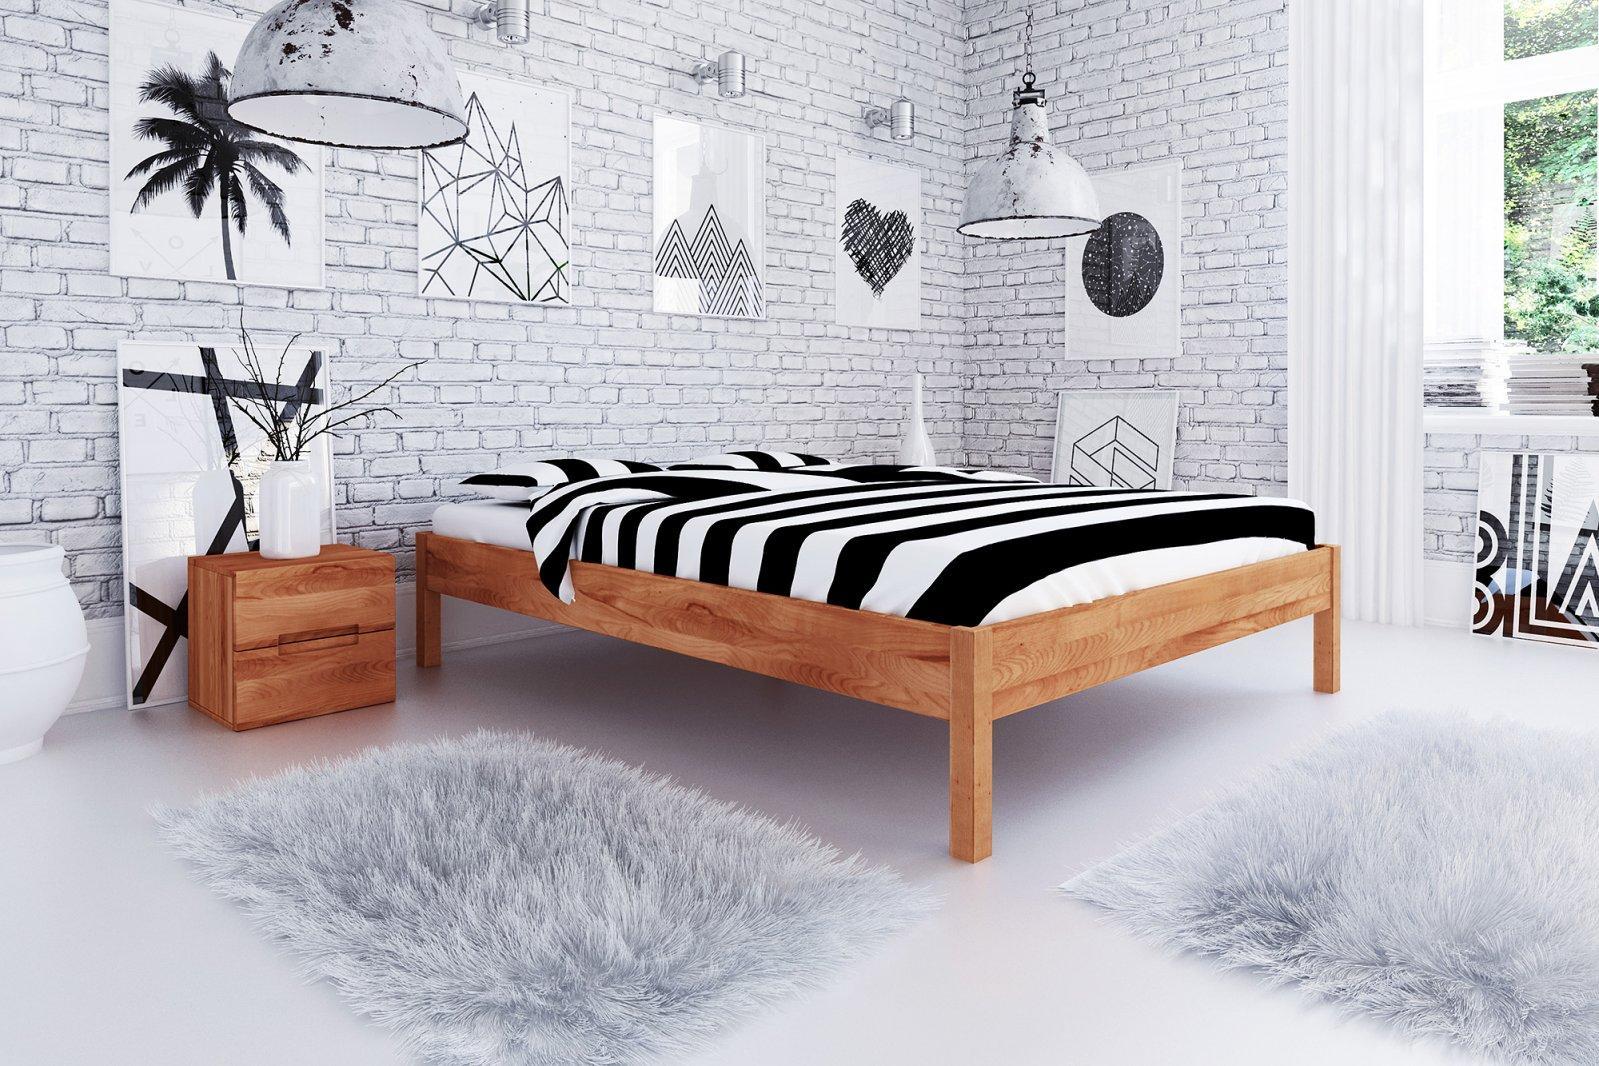 Rama łóżka VENTO A z litego drewna